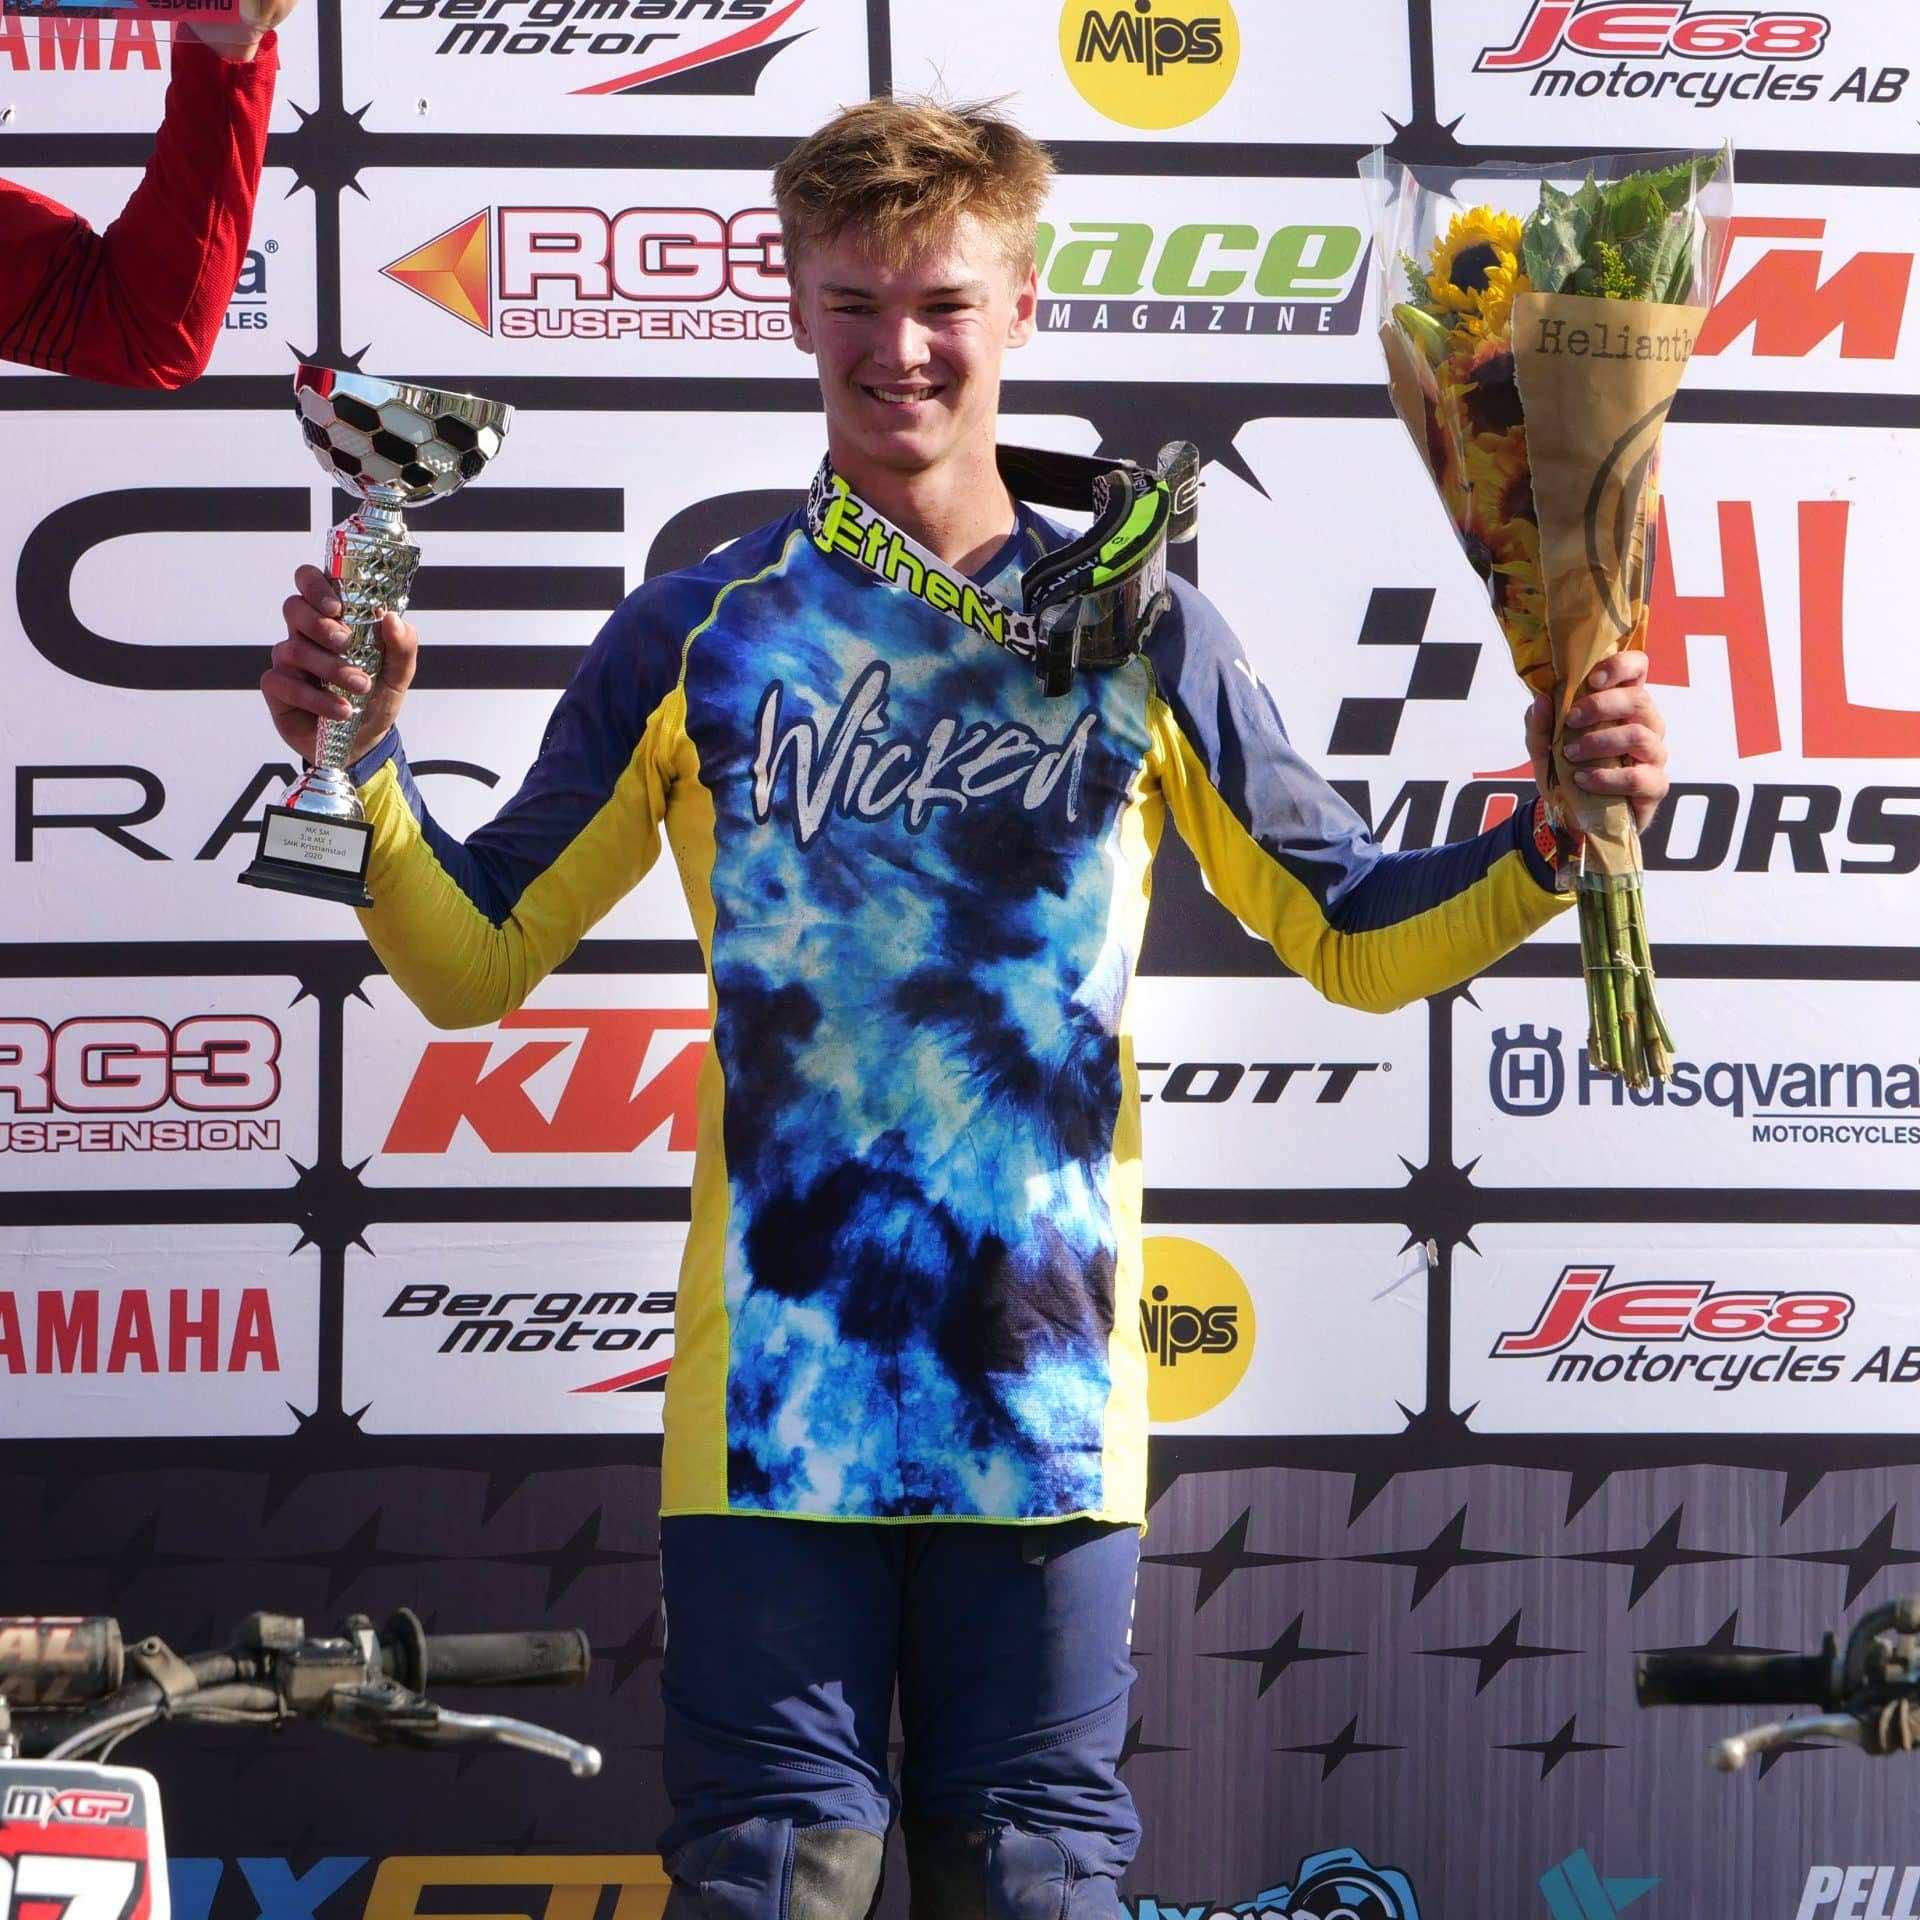 Swedish championchip